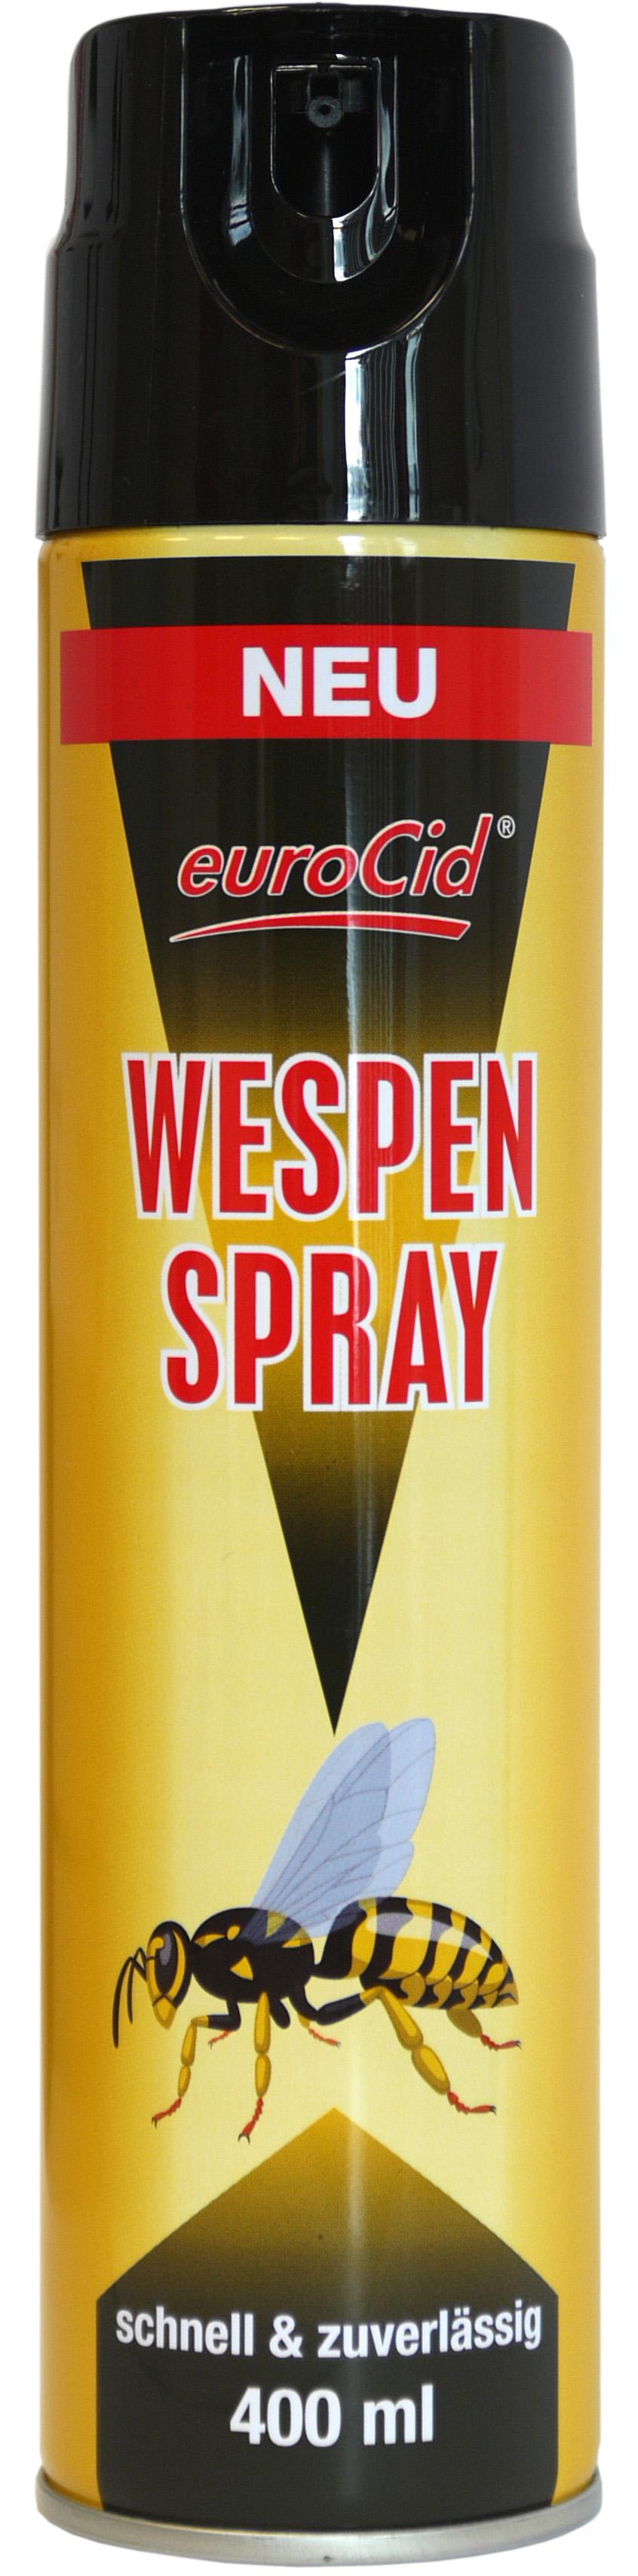 02193 - euroCid Wespenspray 400 ml BIOZID